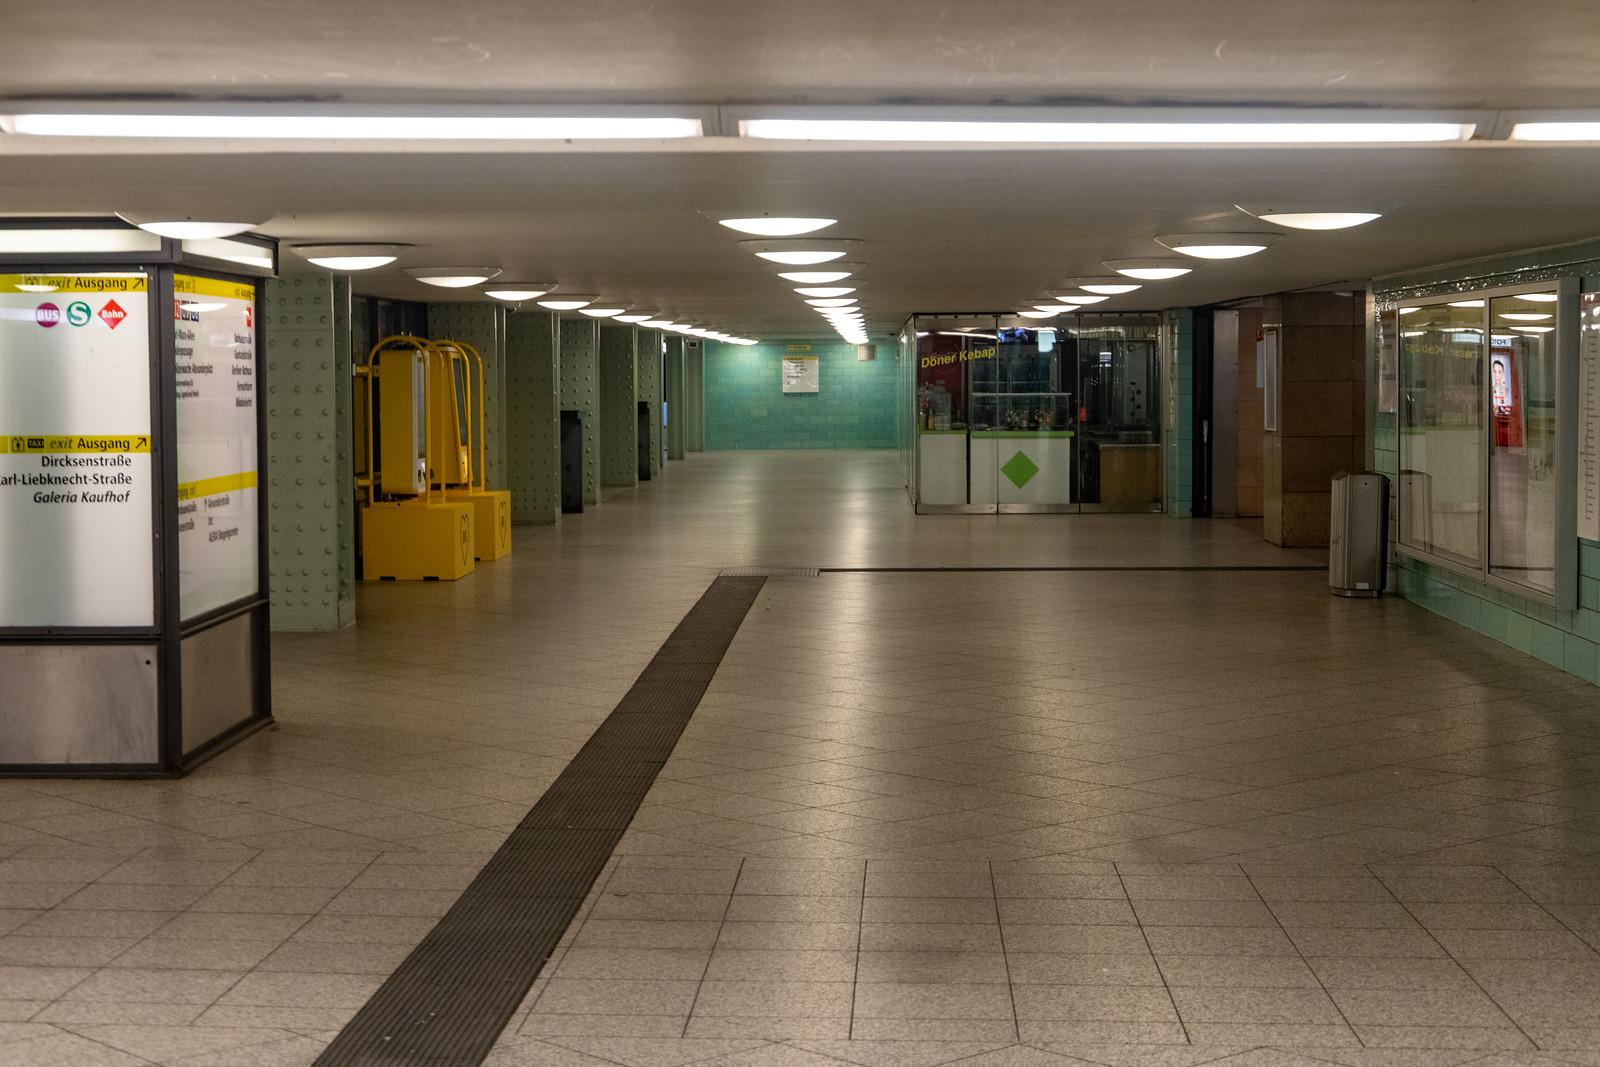 U-Bahnhof Alexanderplatz